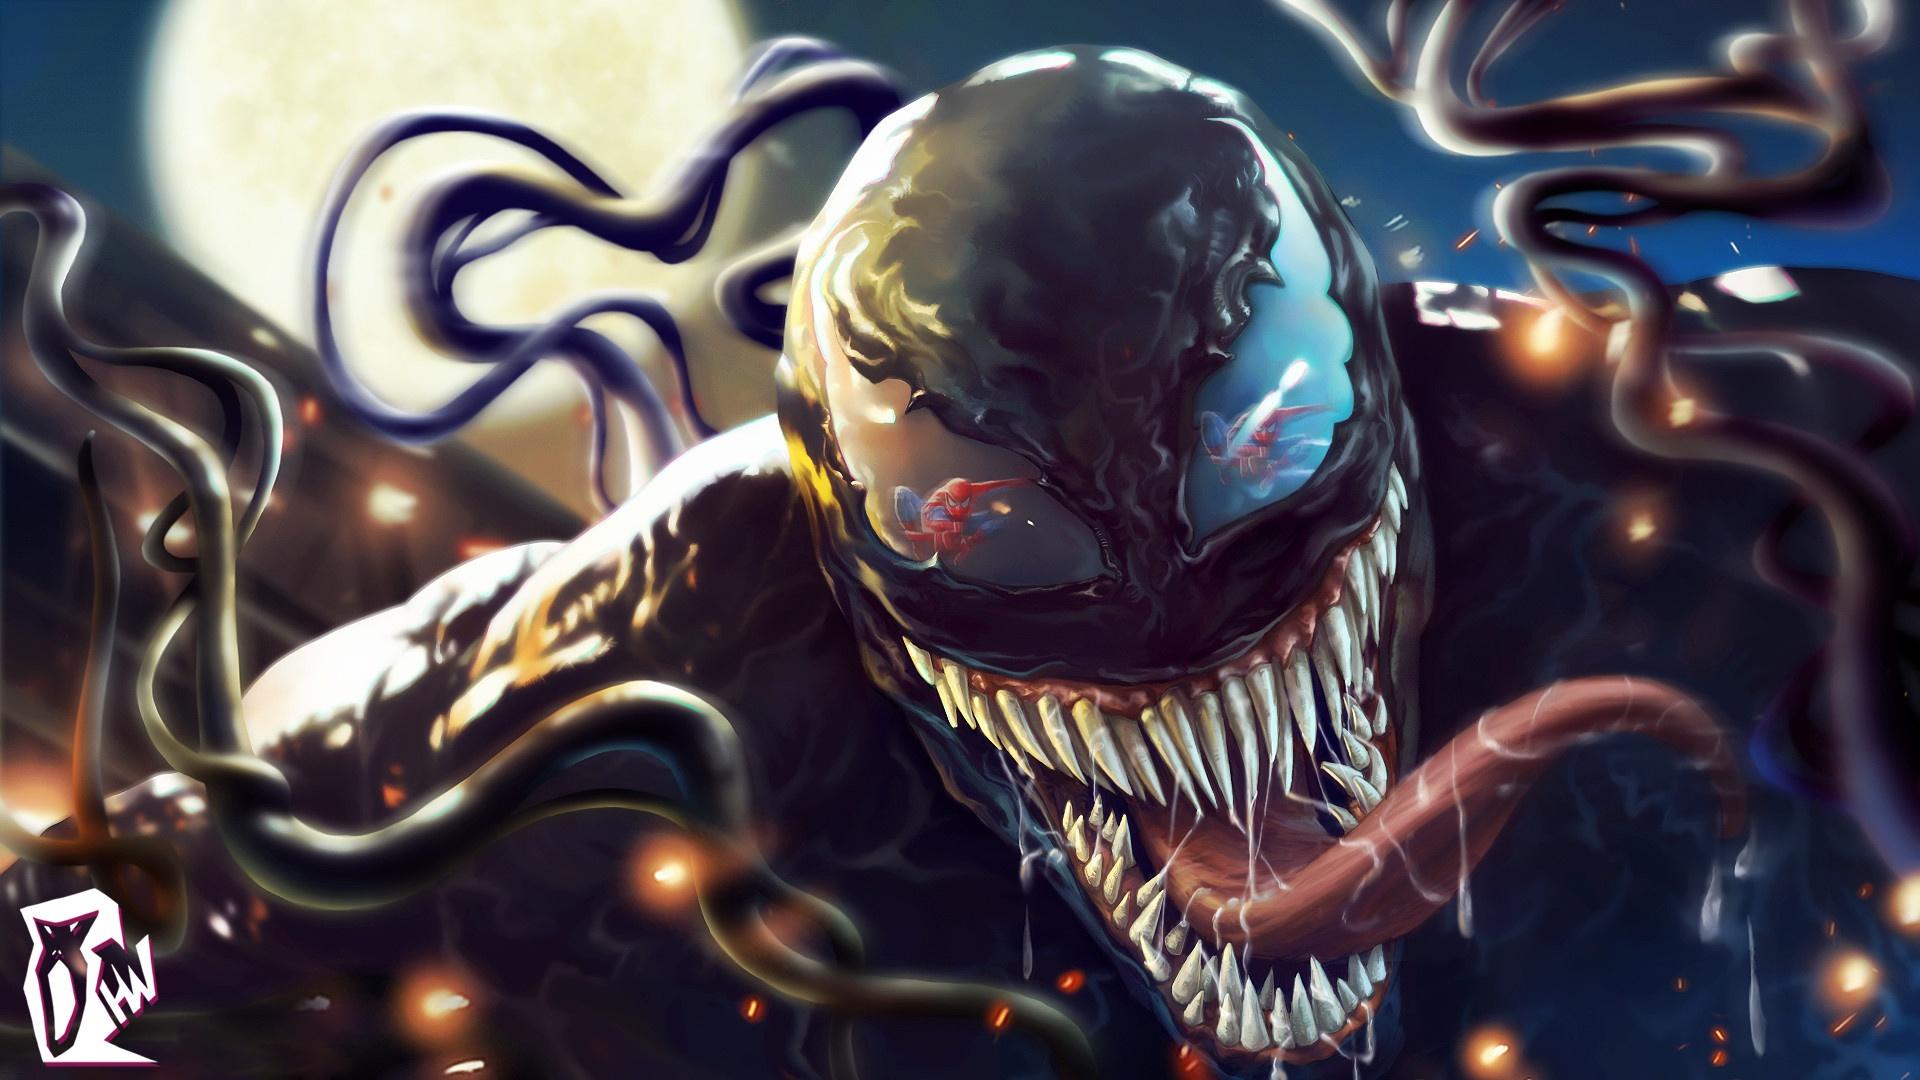 General 1920x1080 Venom digital art creature tongue out teeth